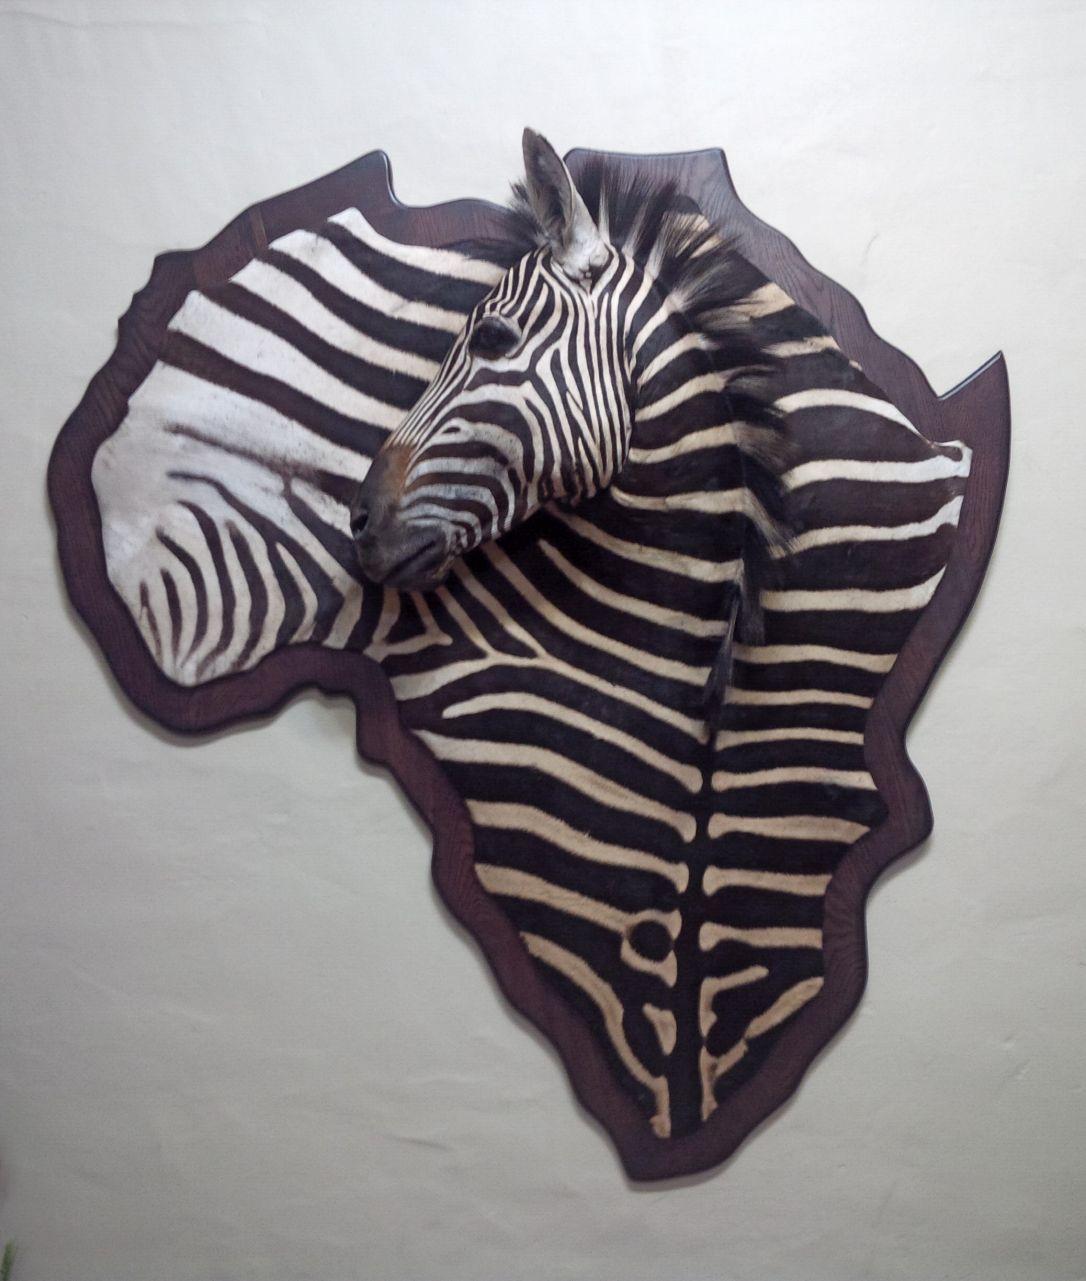 Zebra wall plaque.jpg